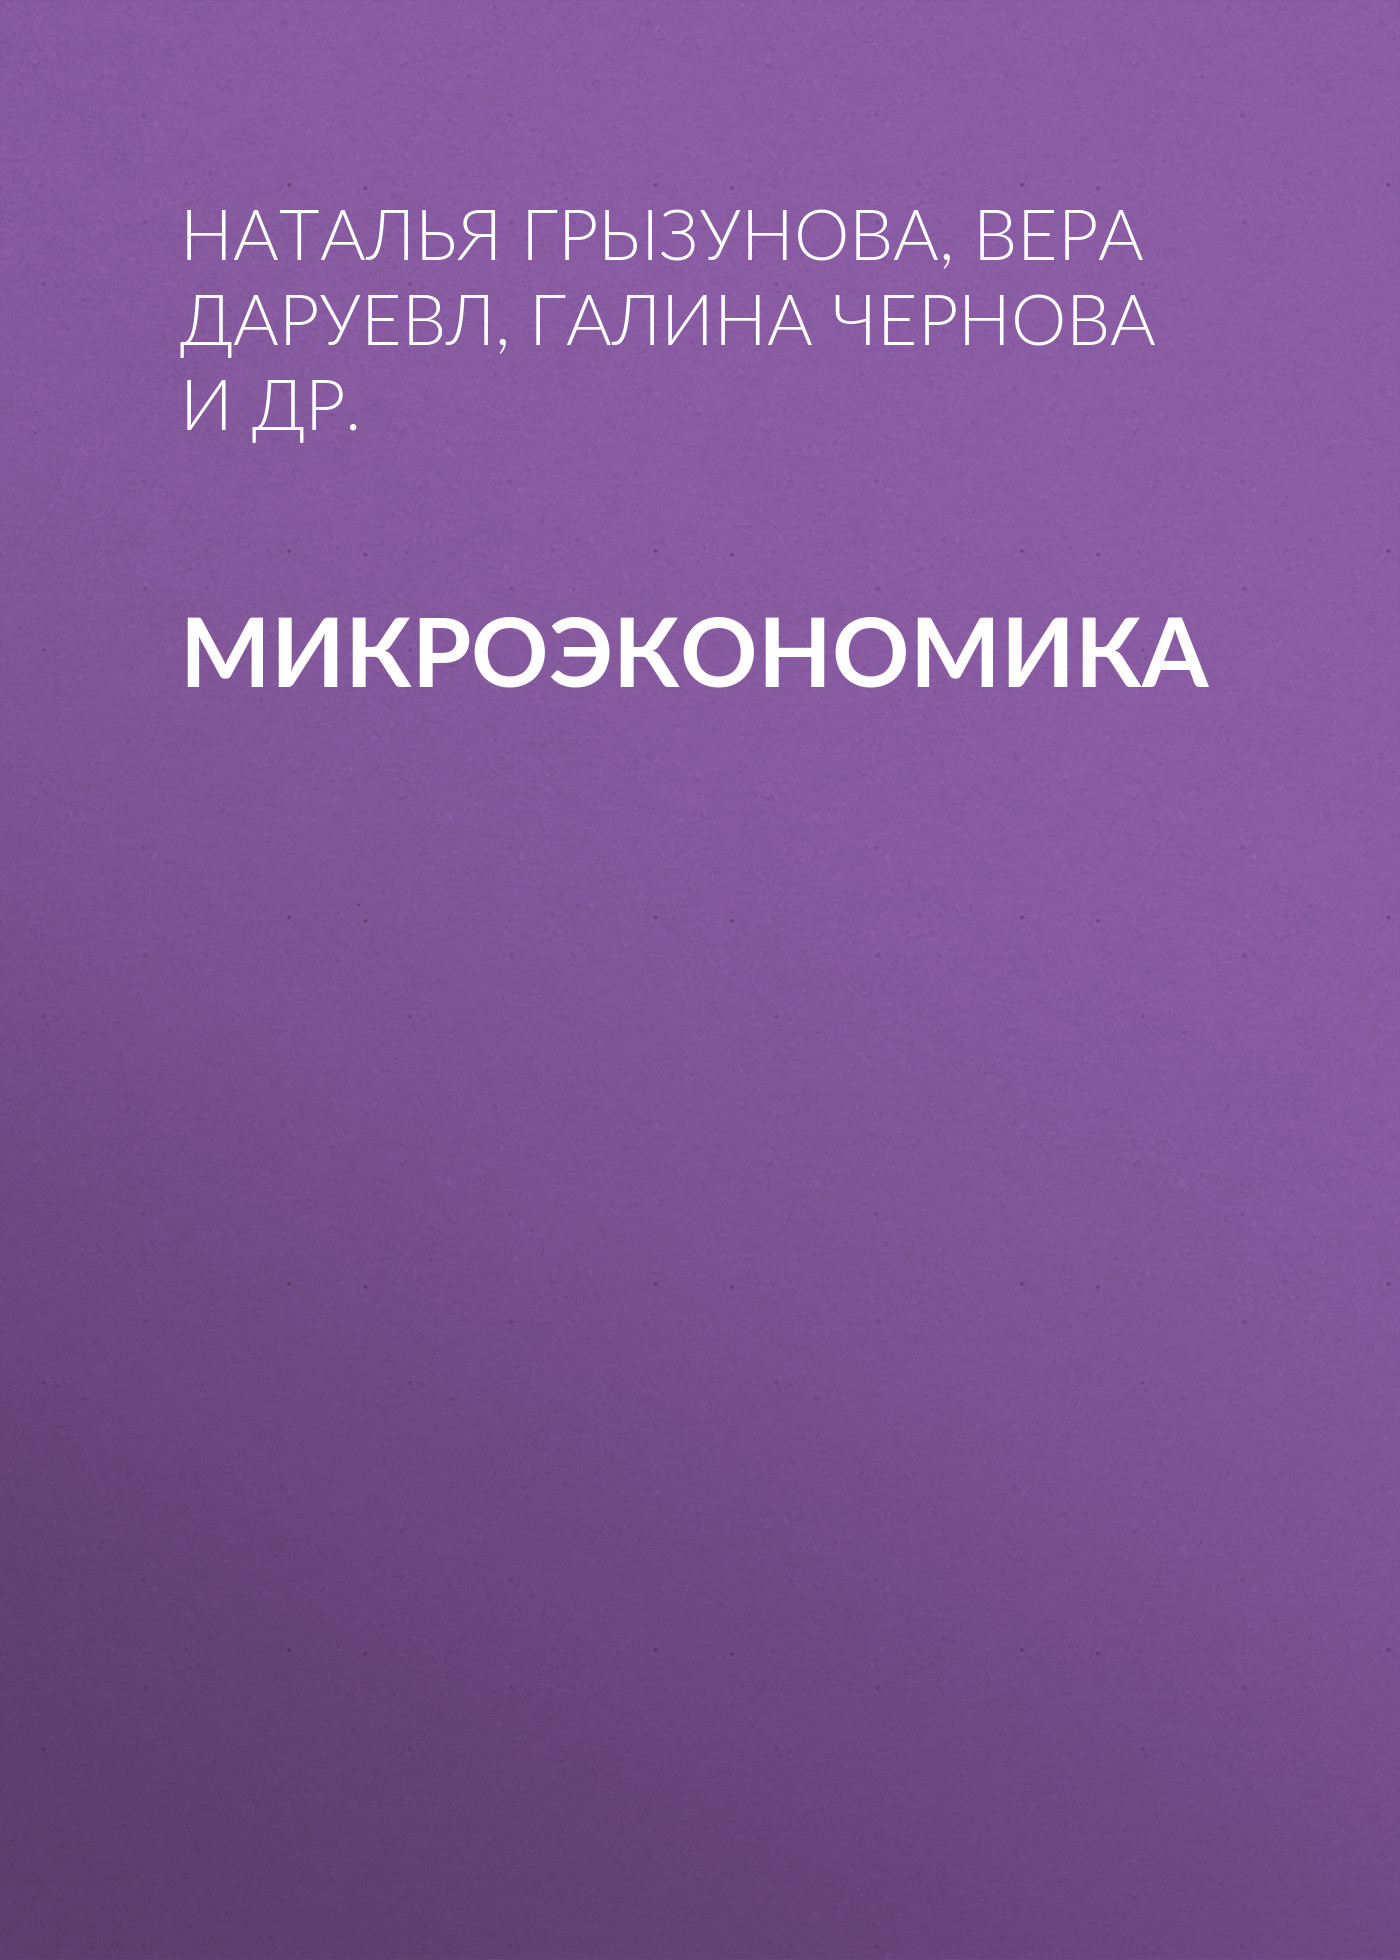 Обложка книги Микроэкономика, автор Вера Даруевл